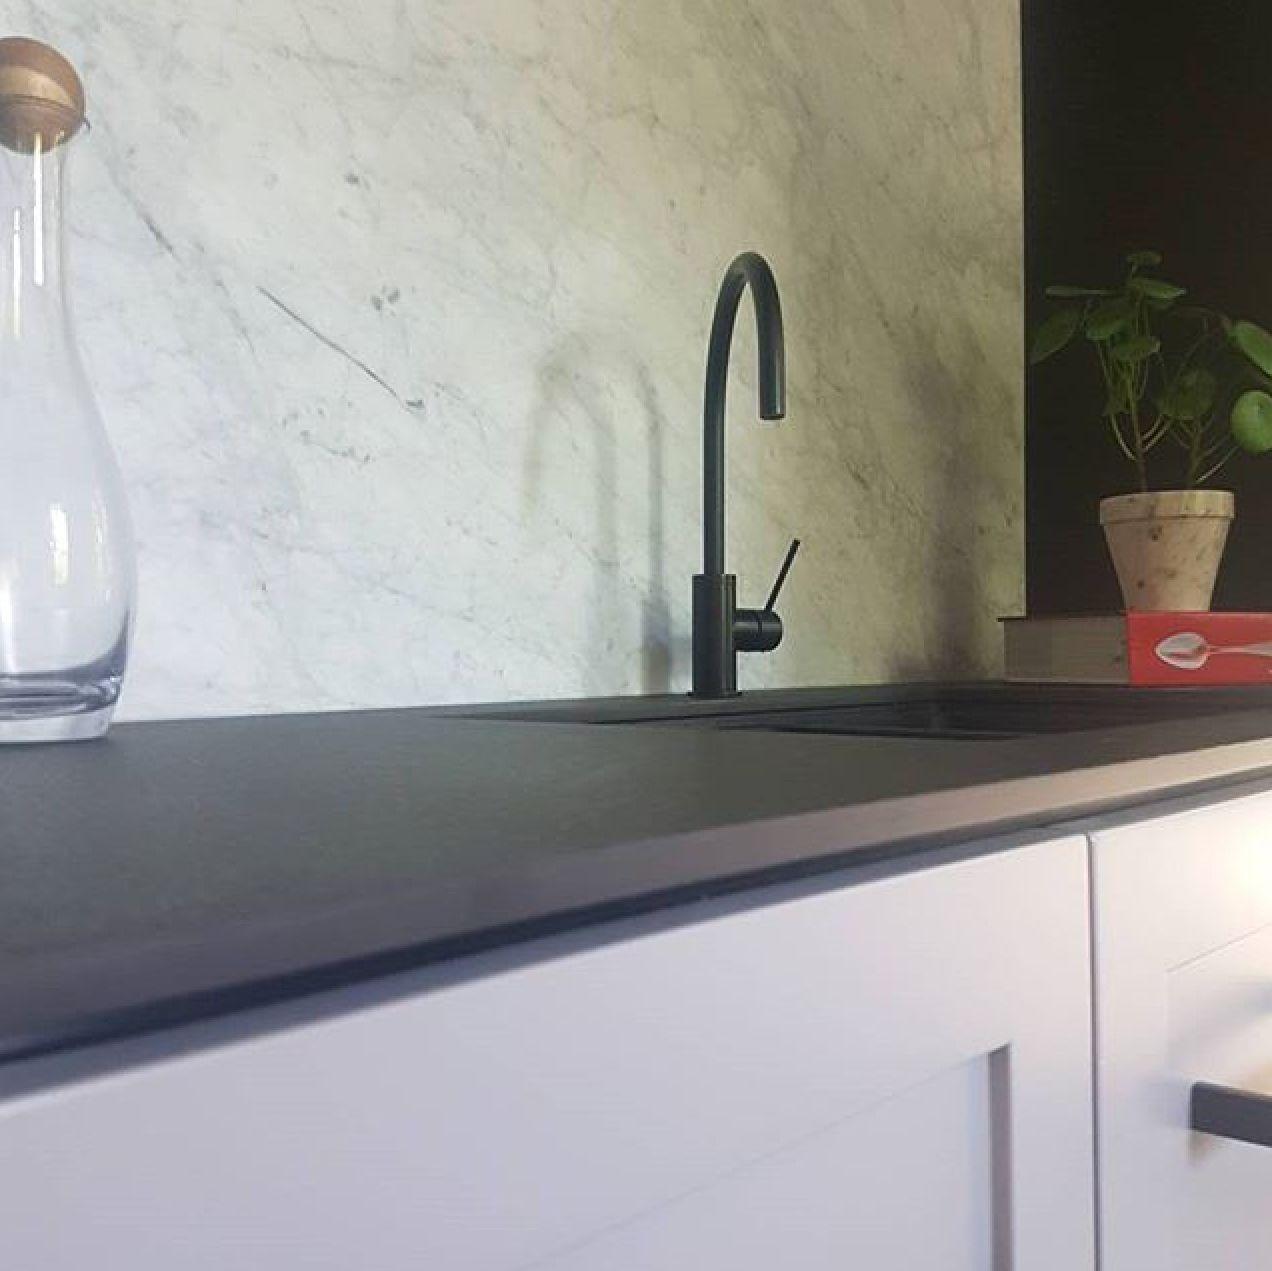 Carrara Marble Kitchen Benchtops: Ash Grey QUANTUM QUARTZ Benchtops Amp Splashback By Cahill